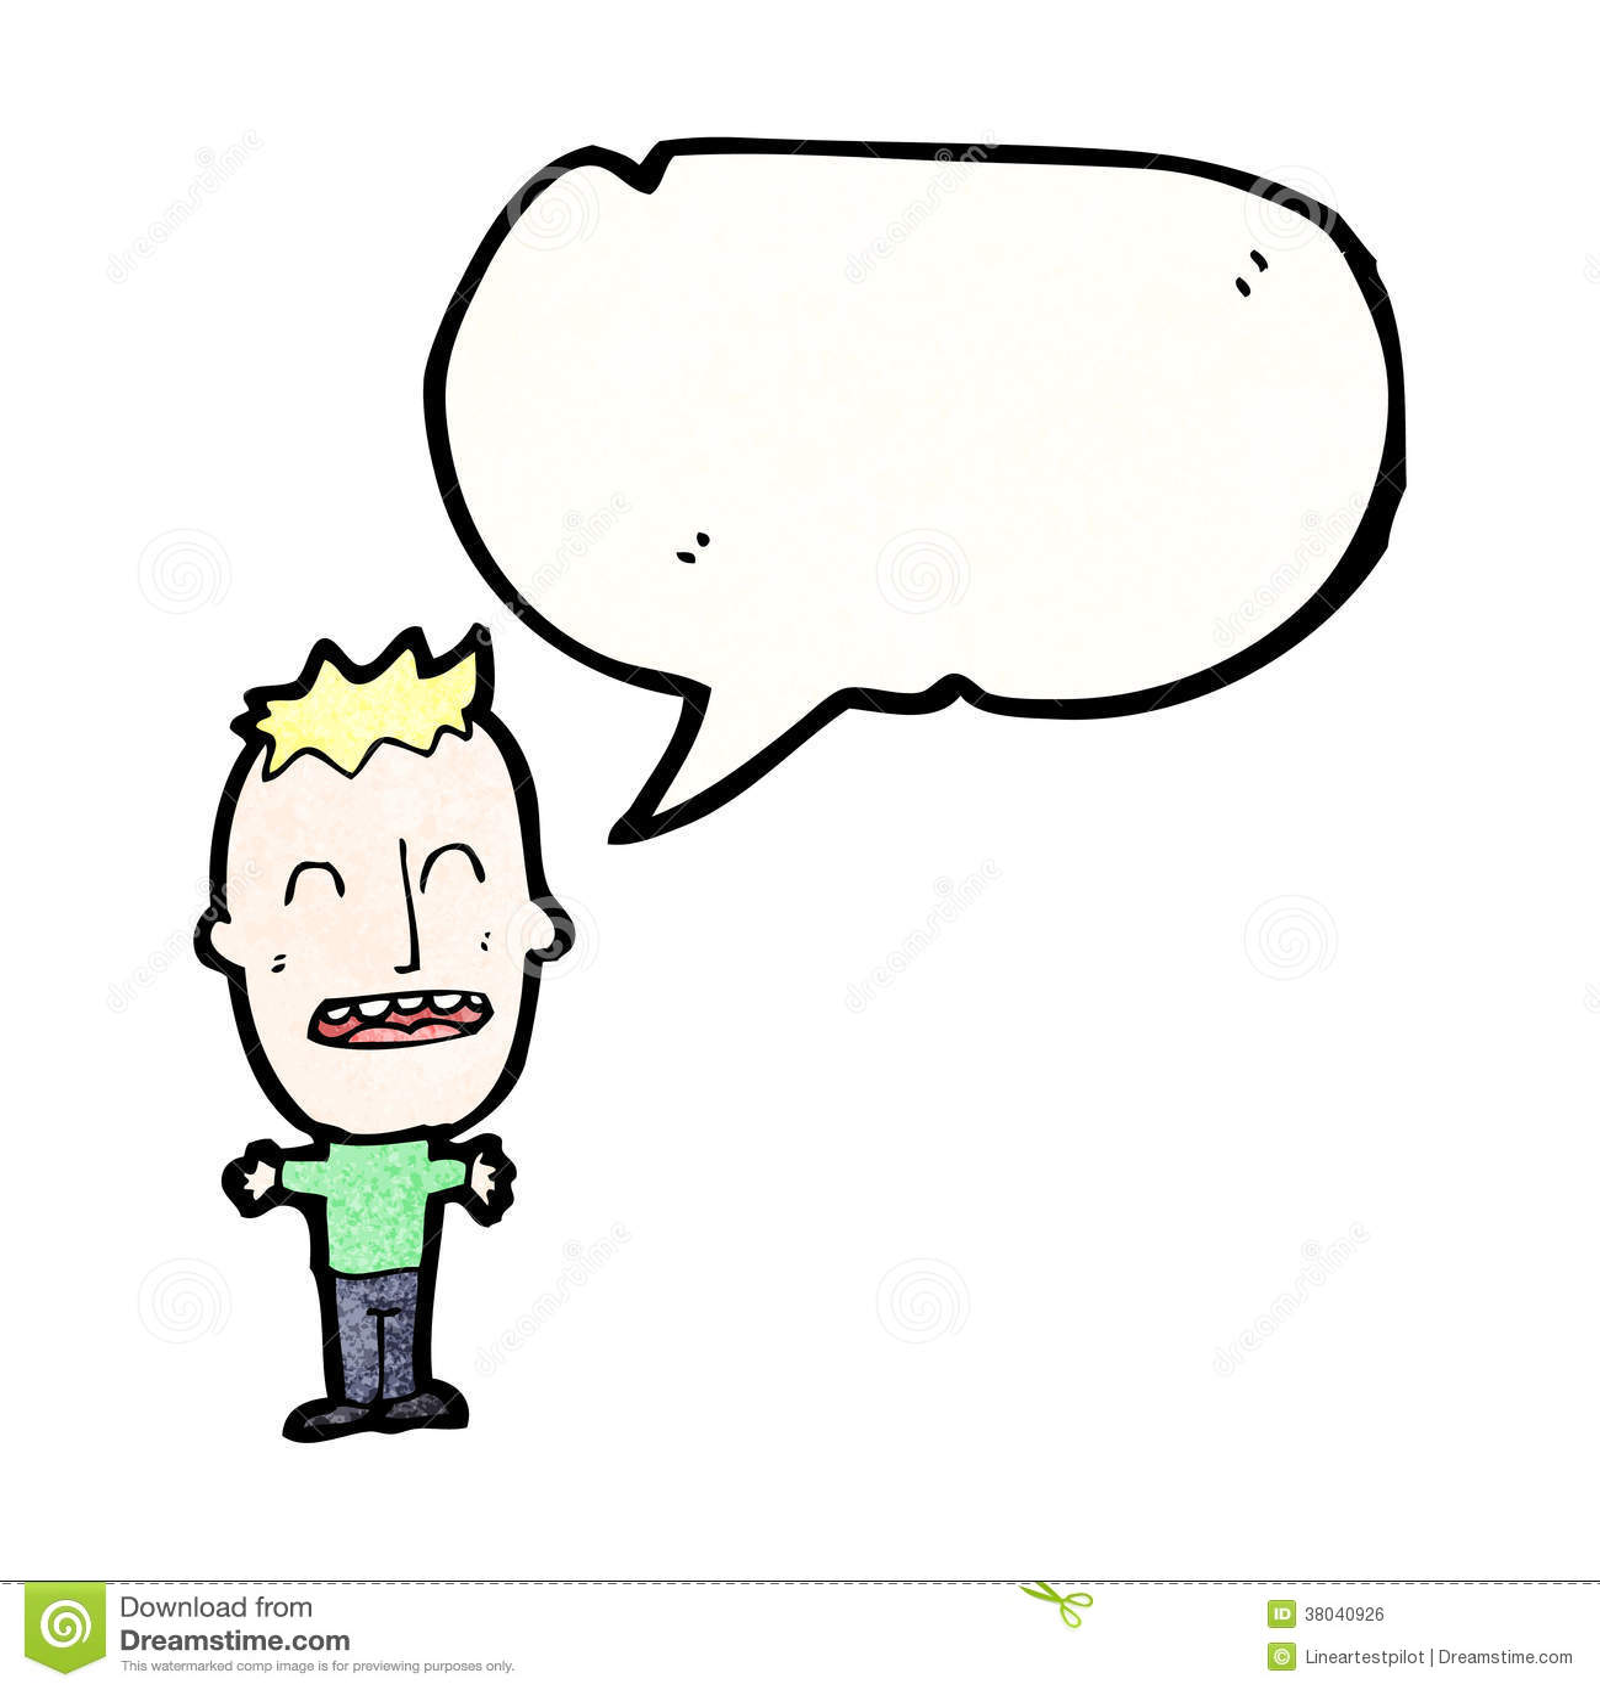 Cartoon Characters With Big Heads : Big head boy cartoon royalty free stock image